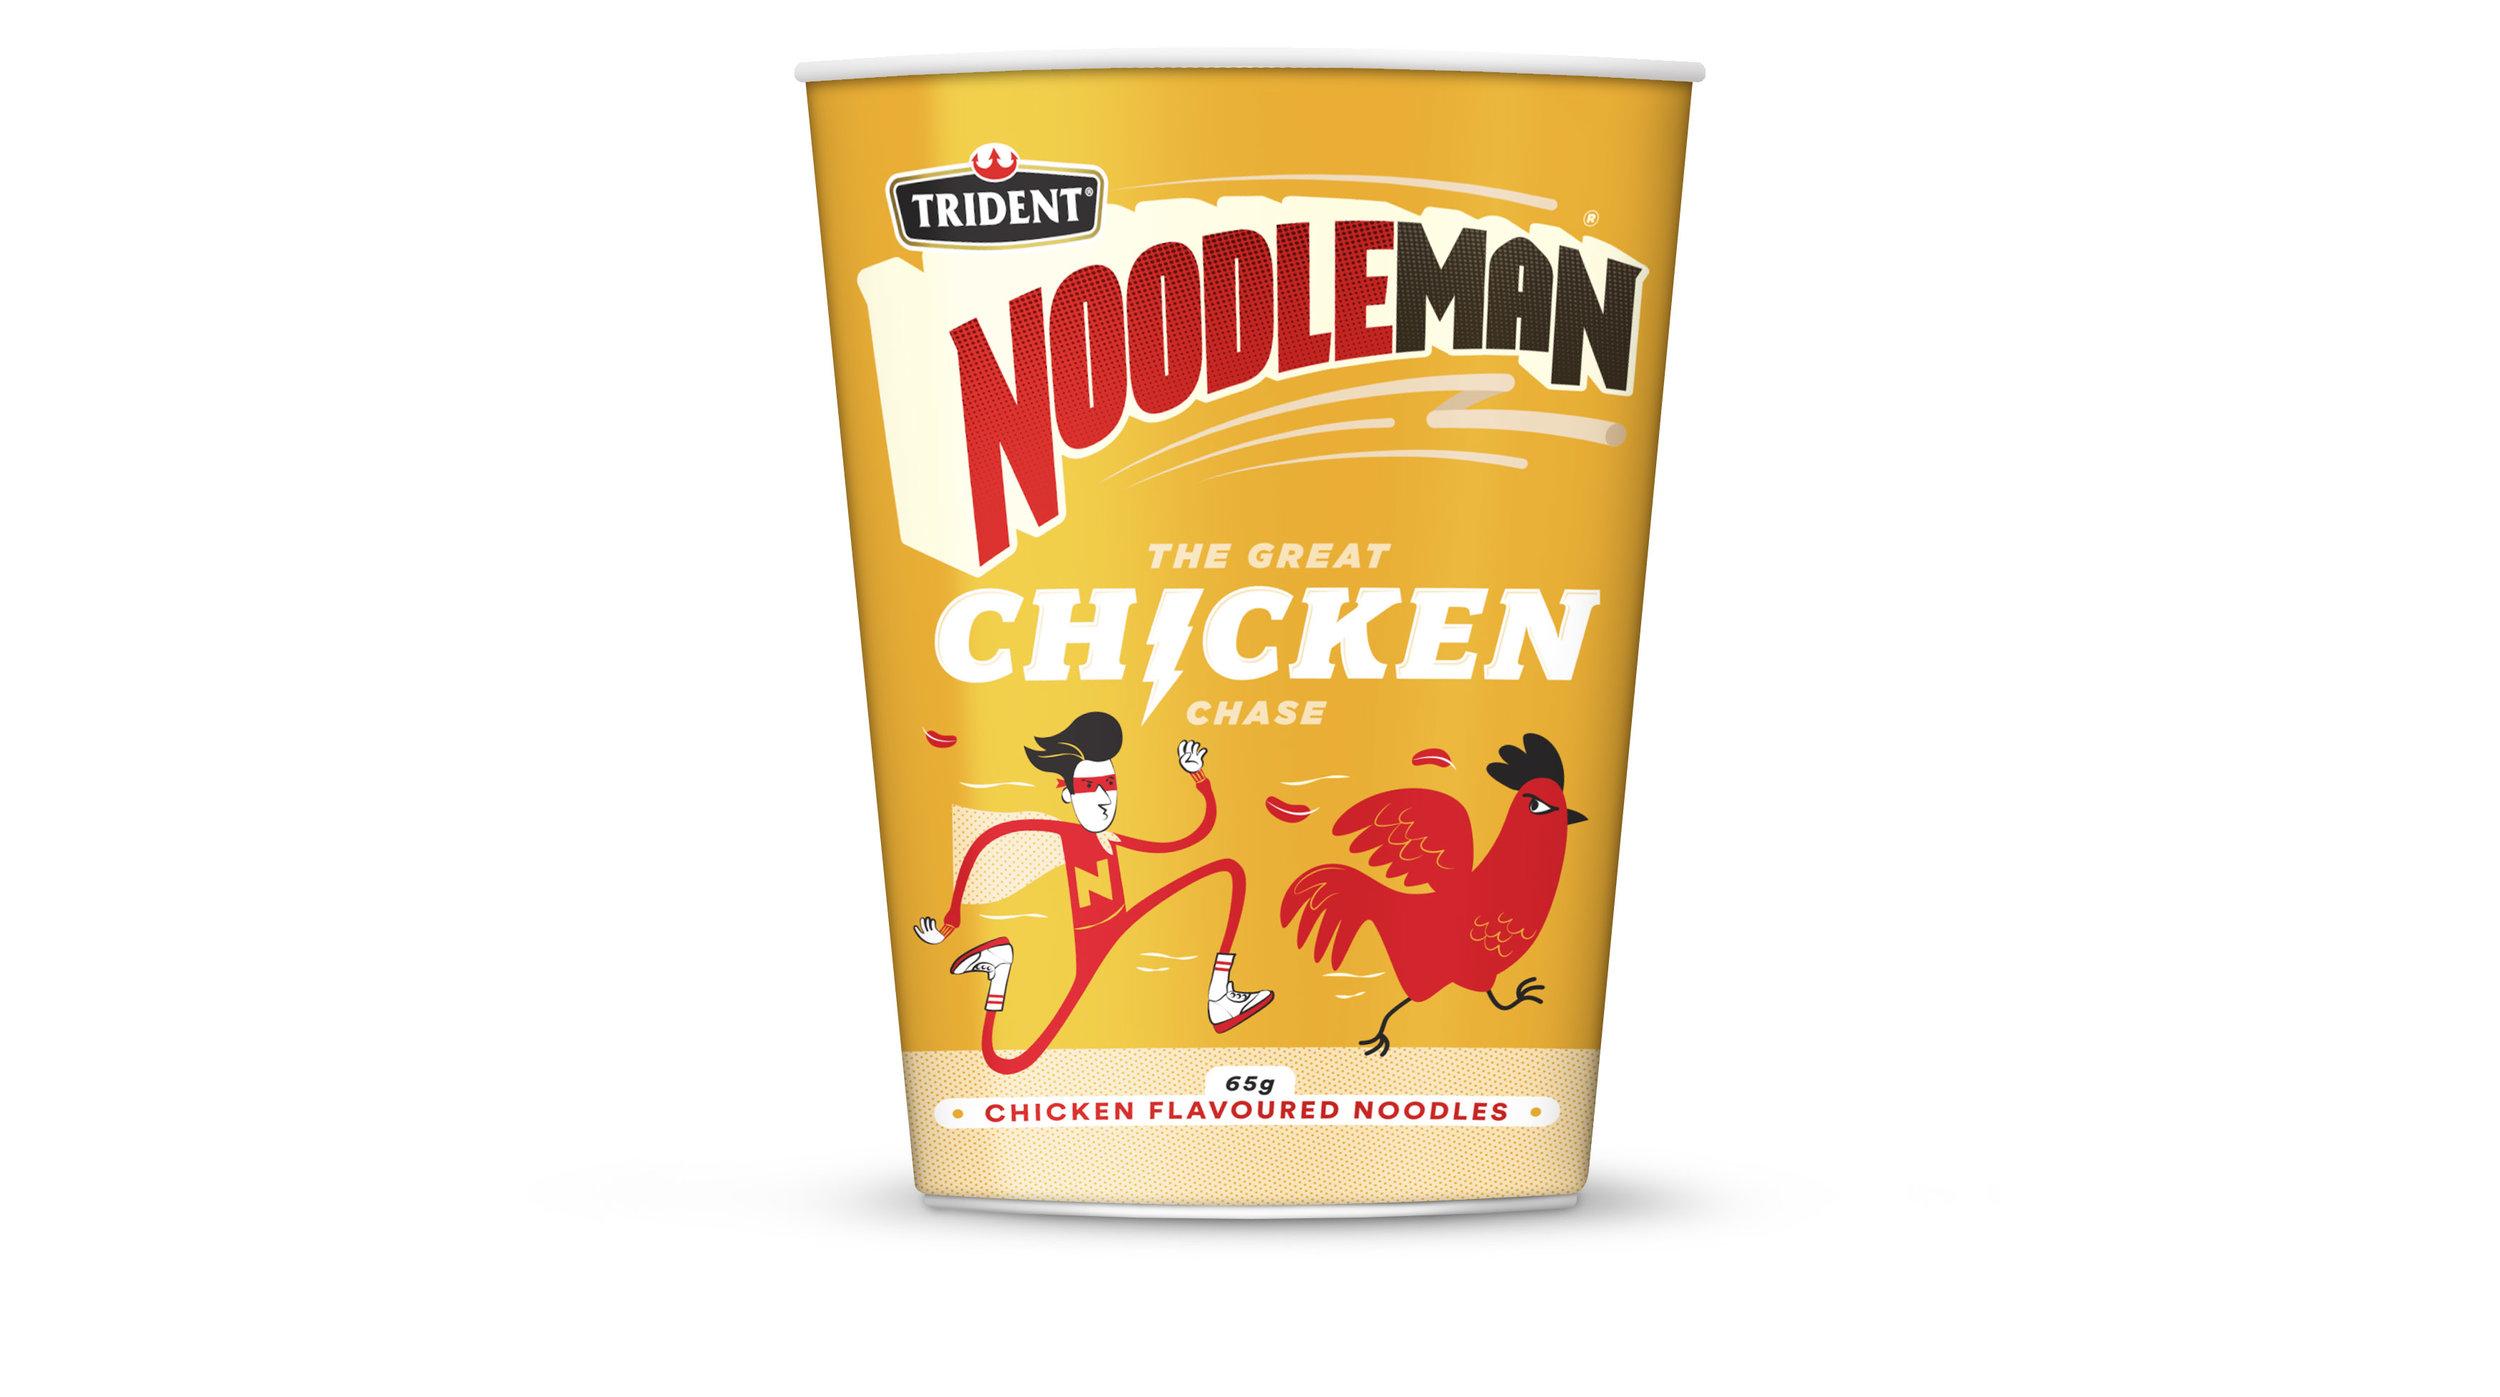 Noodleman Chicken Noodle Cup